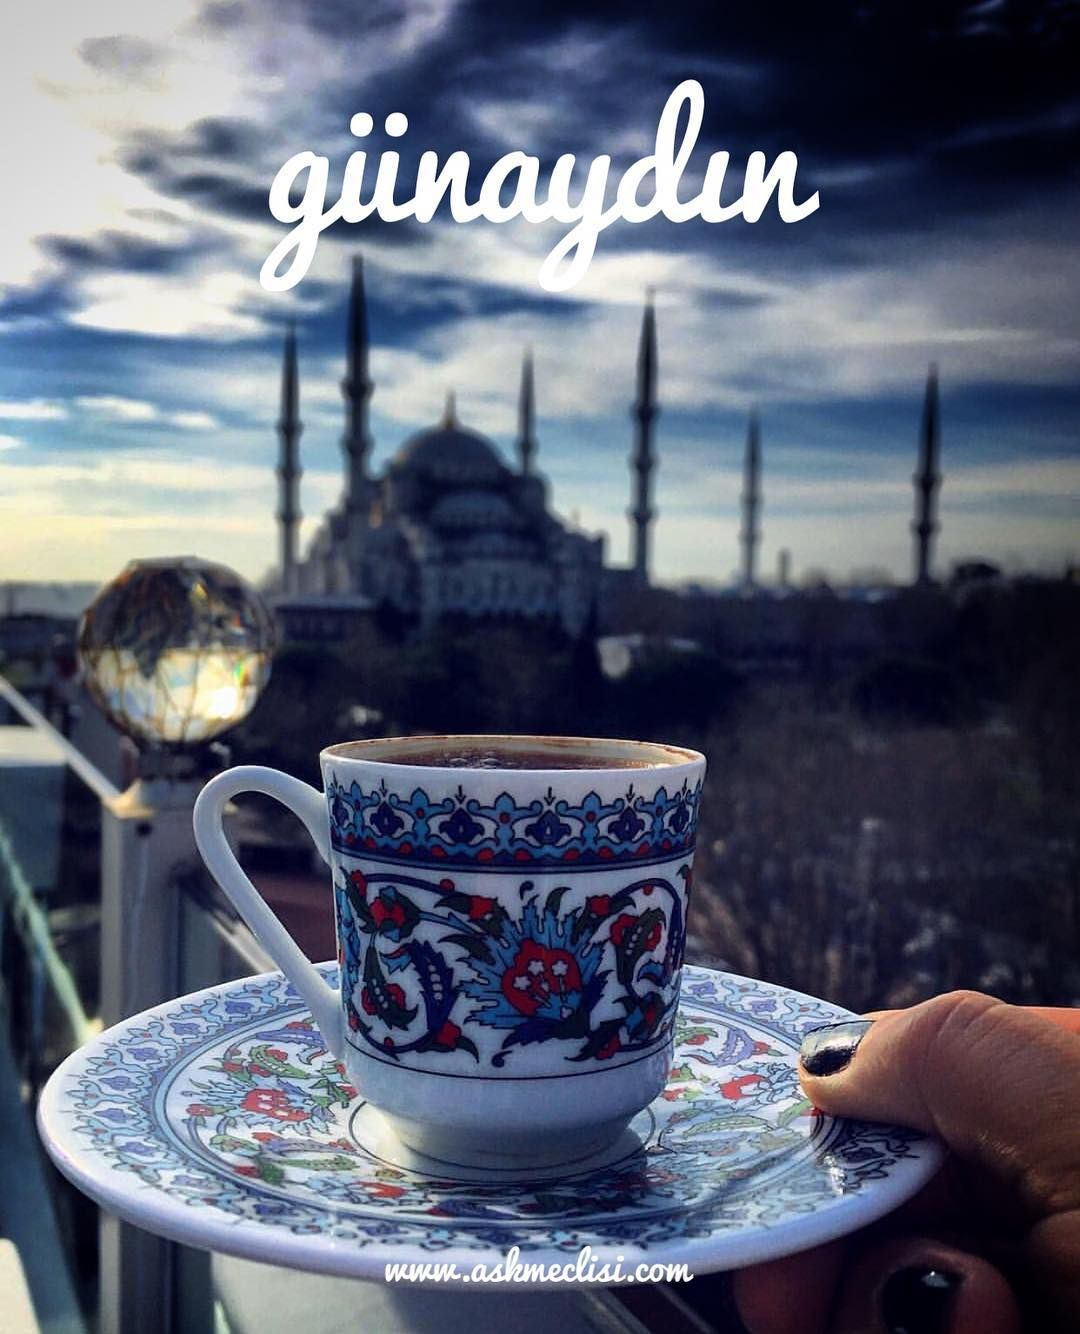 Пожелание доброго утра любимому на турецком